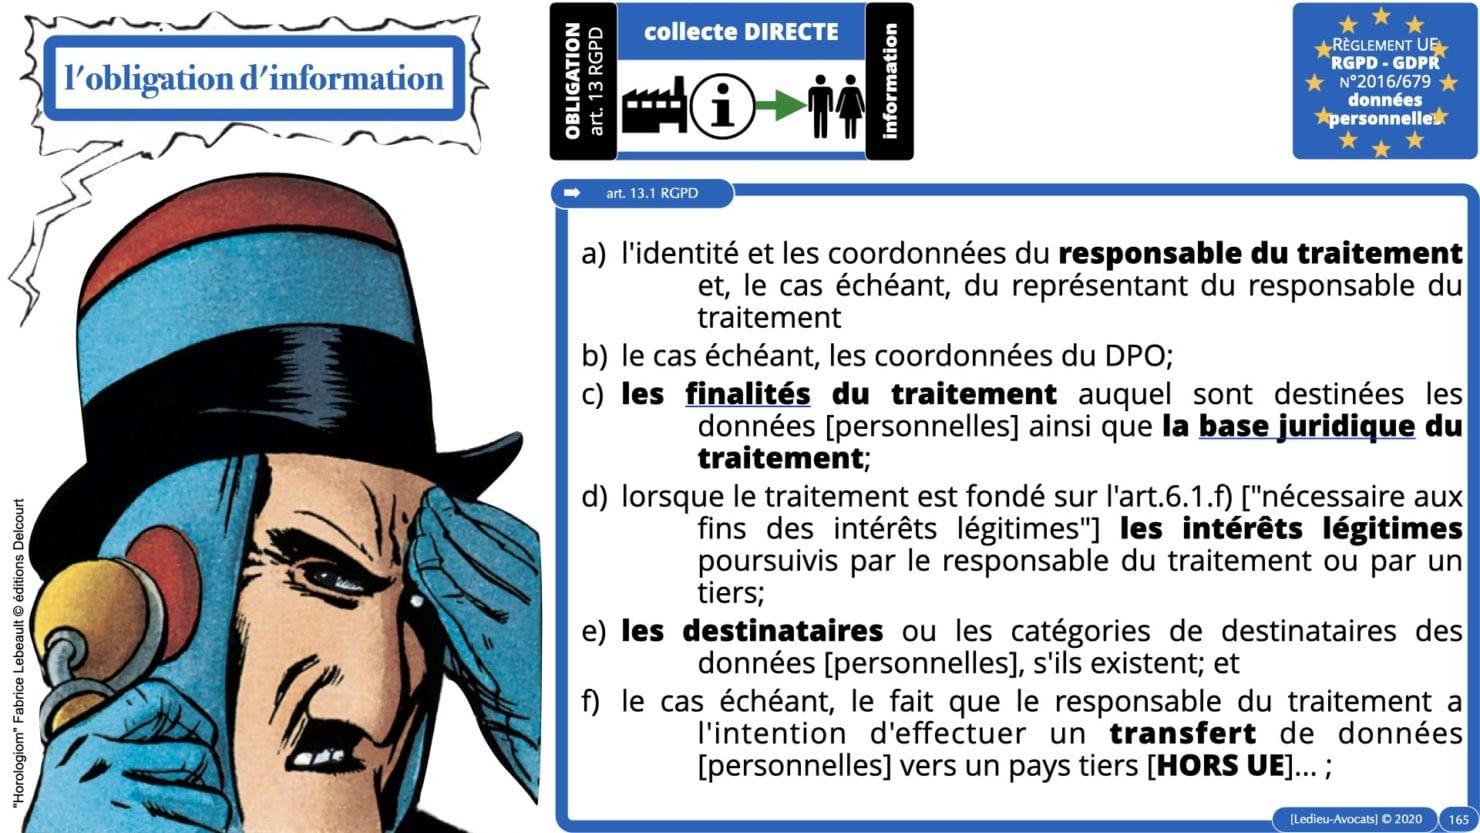 RGPD e-Privacy principes actualité jurisprudence ©Ledieu-Avocats 25-06-2021.165